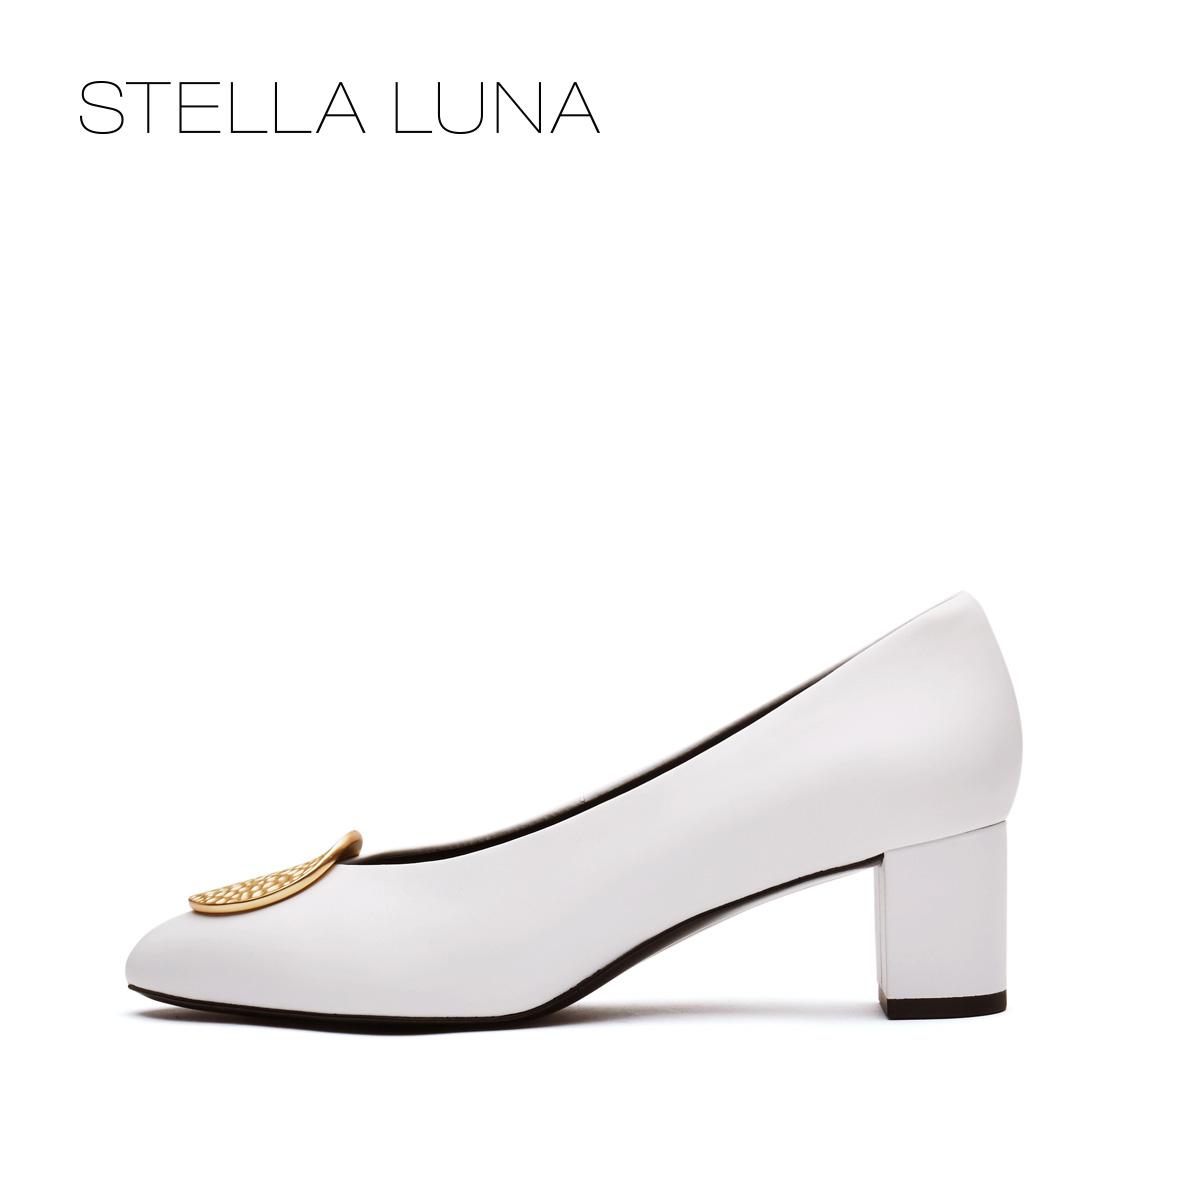 STELLA LUNA牛皮古铜钱饰扣粗跟女士单鞋 SH133L22152